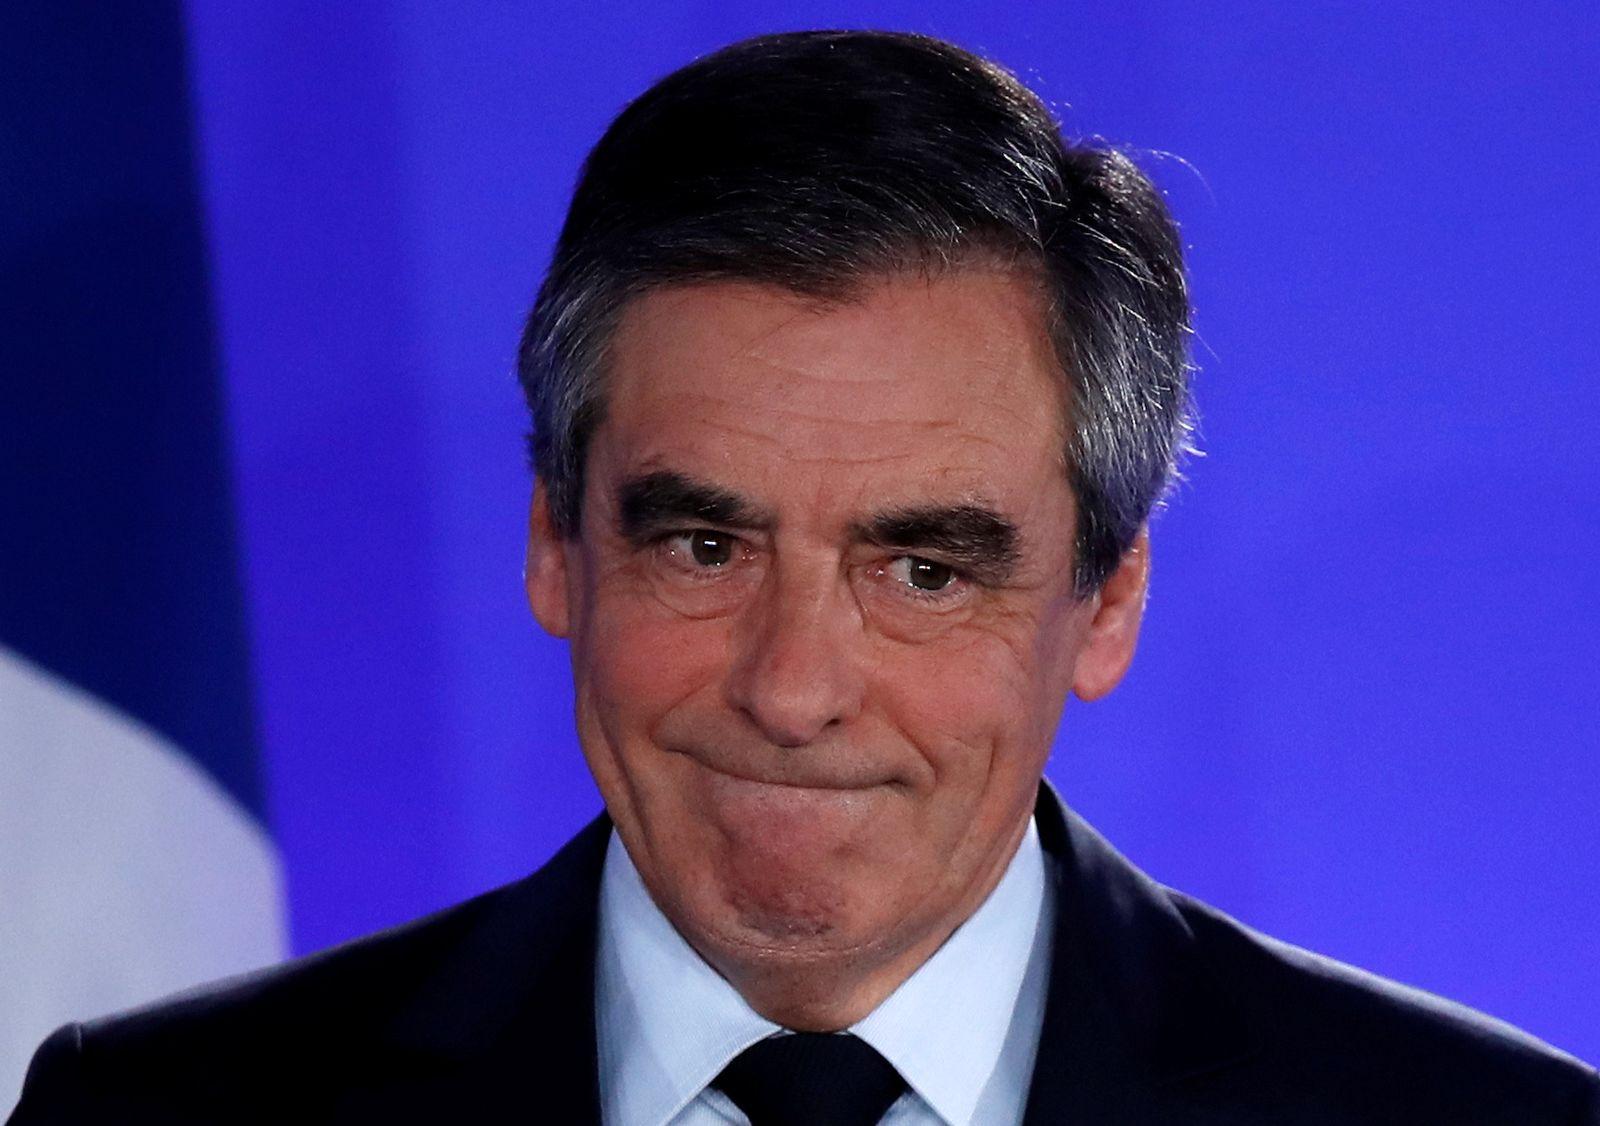 FRANCE-ELECTION/